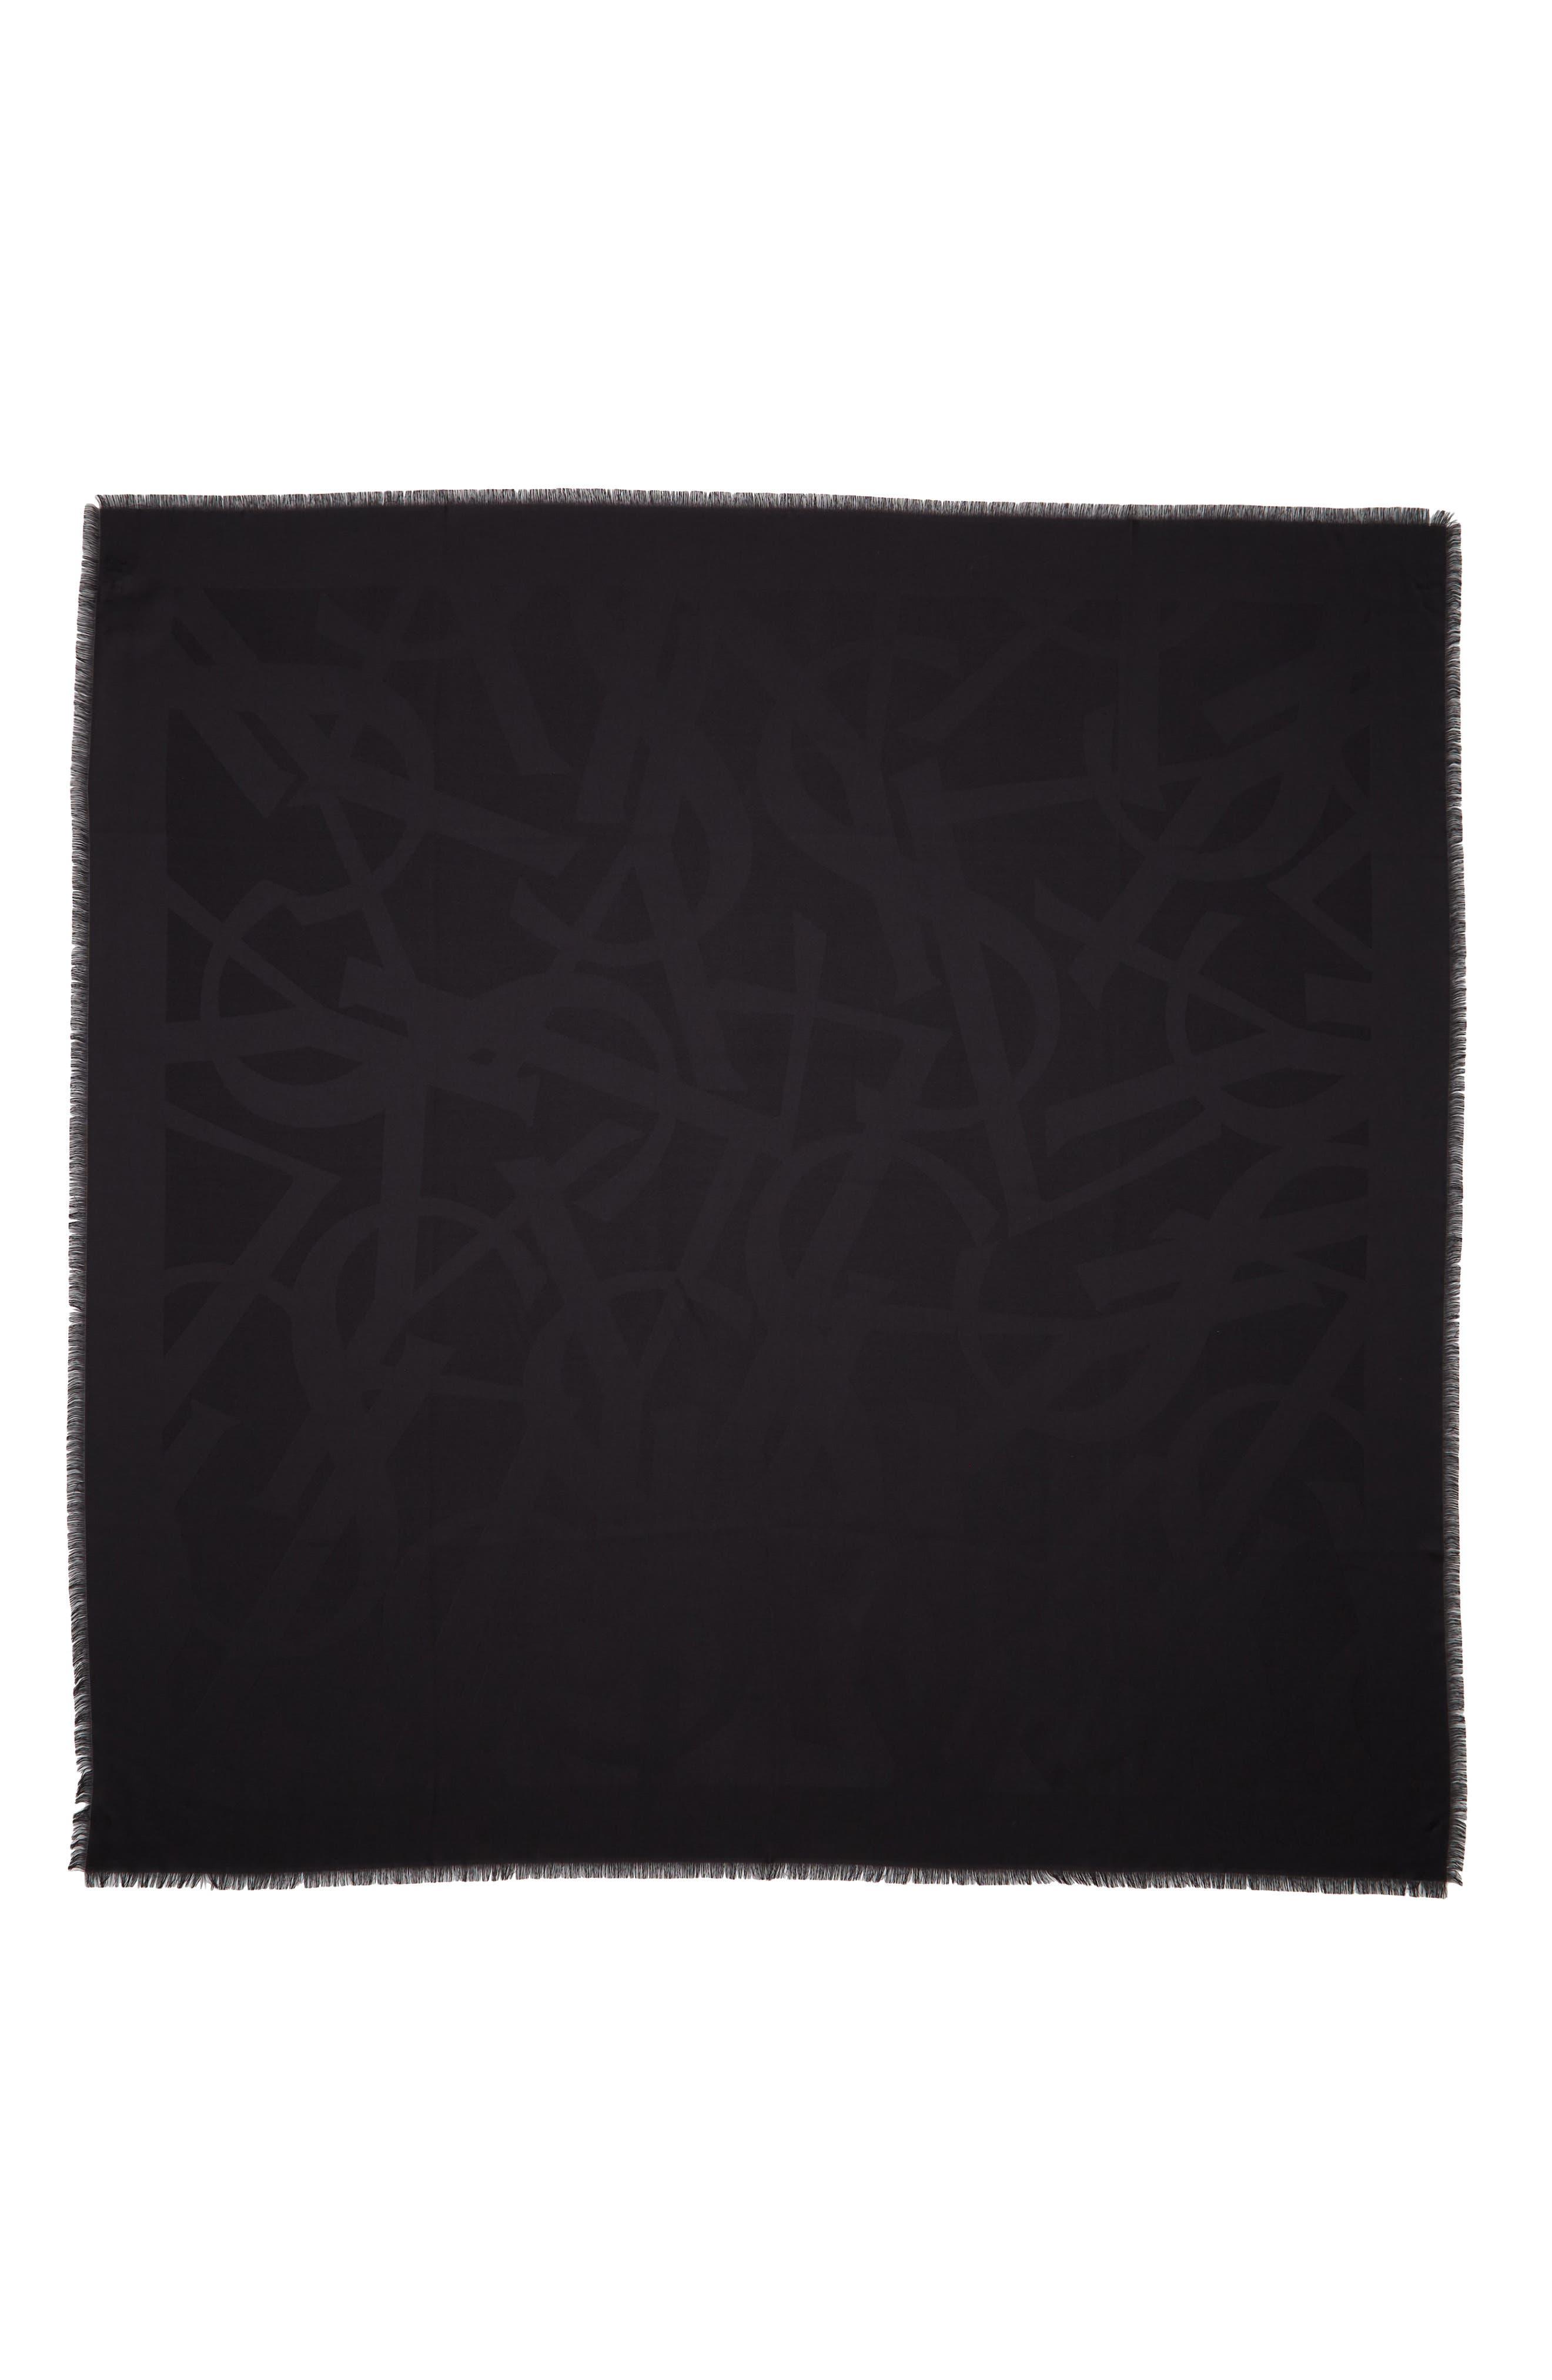 YSL Random Logo Silk Jacquard Scarf,                             Main thumbnail 1, color,                             Black